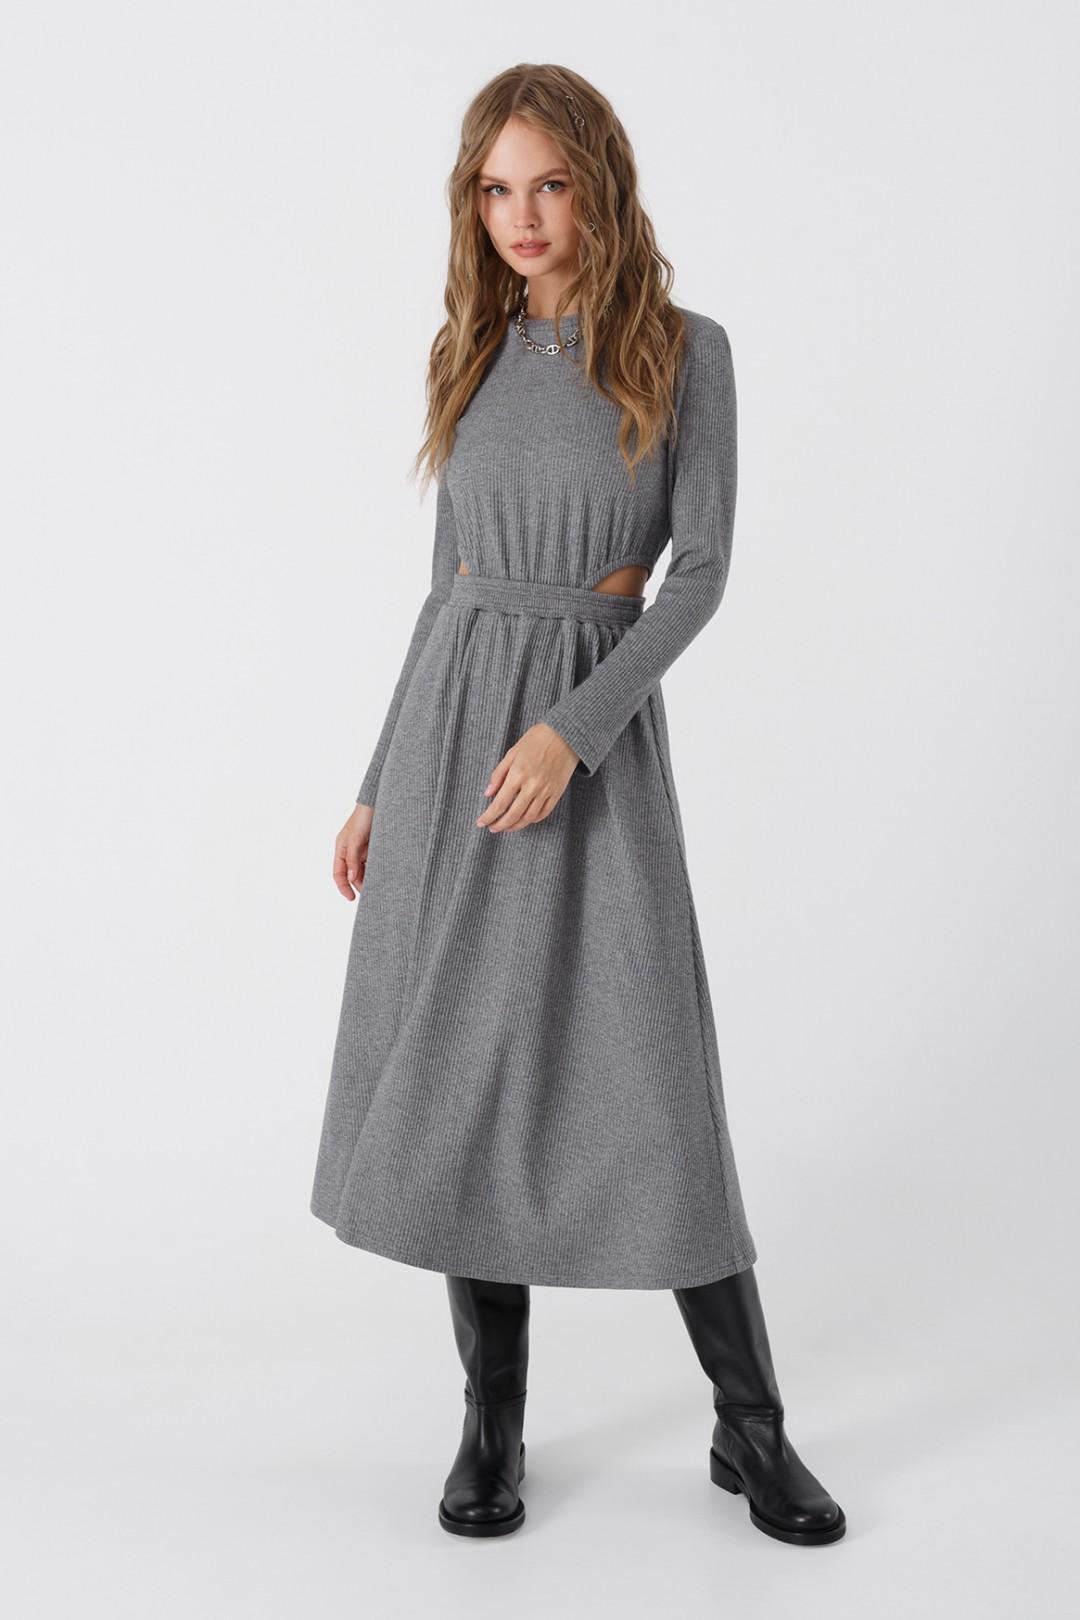 Платье Pirs 3444 серый